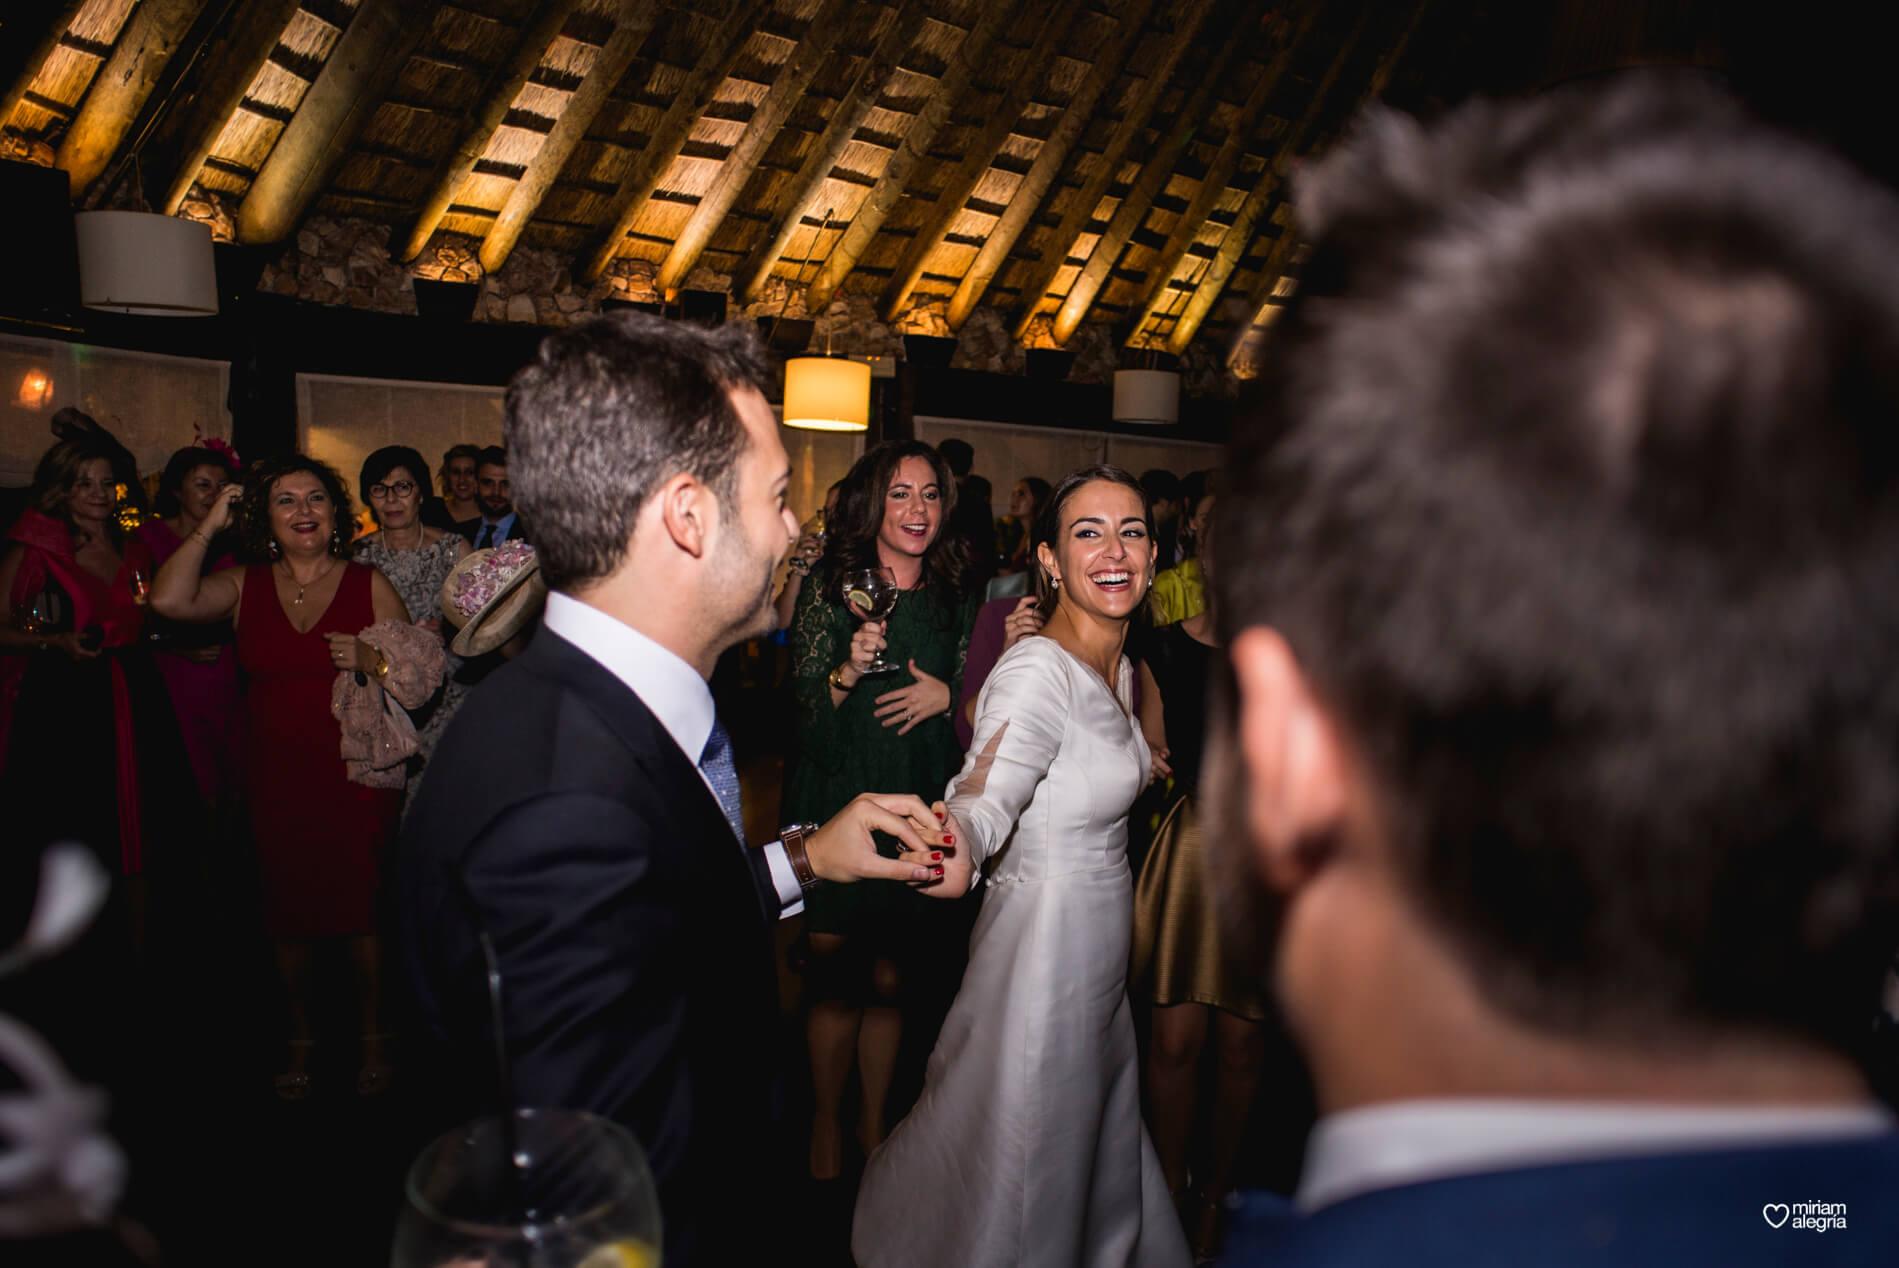 vestido-de-novia-paula-del-vas-miriam-alegria-fotografos-boda-murcia-187